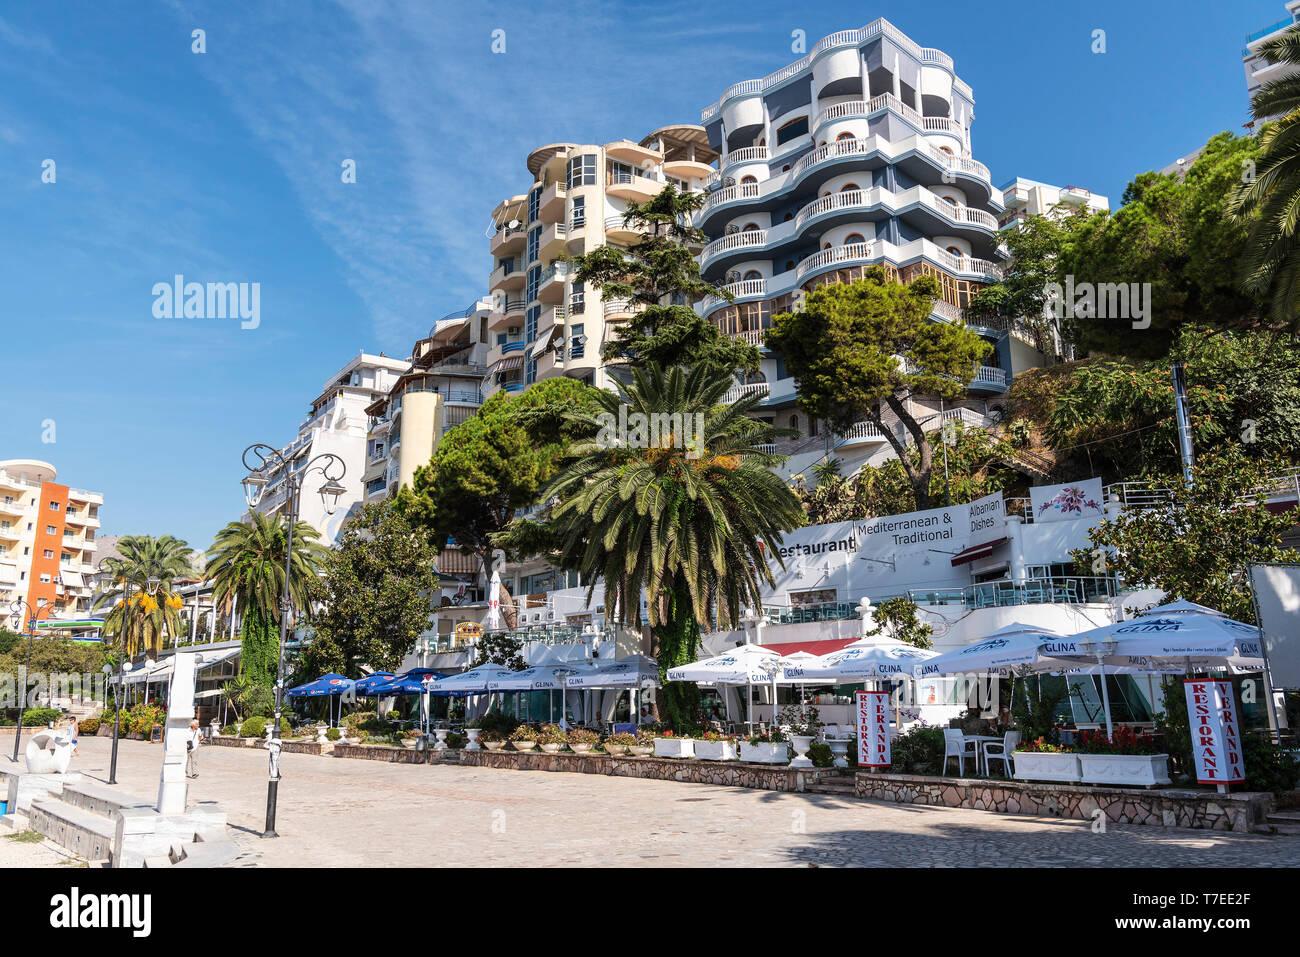 Restaurantes, paseo, Saranda, Albania Foto de stock